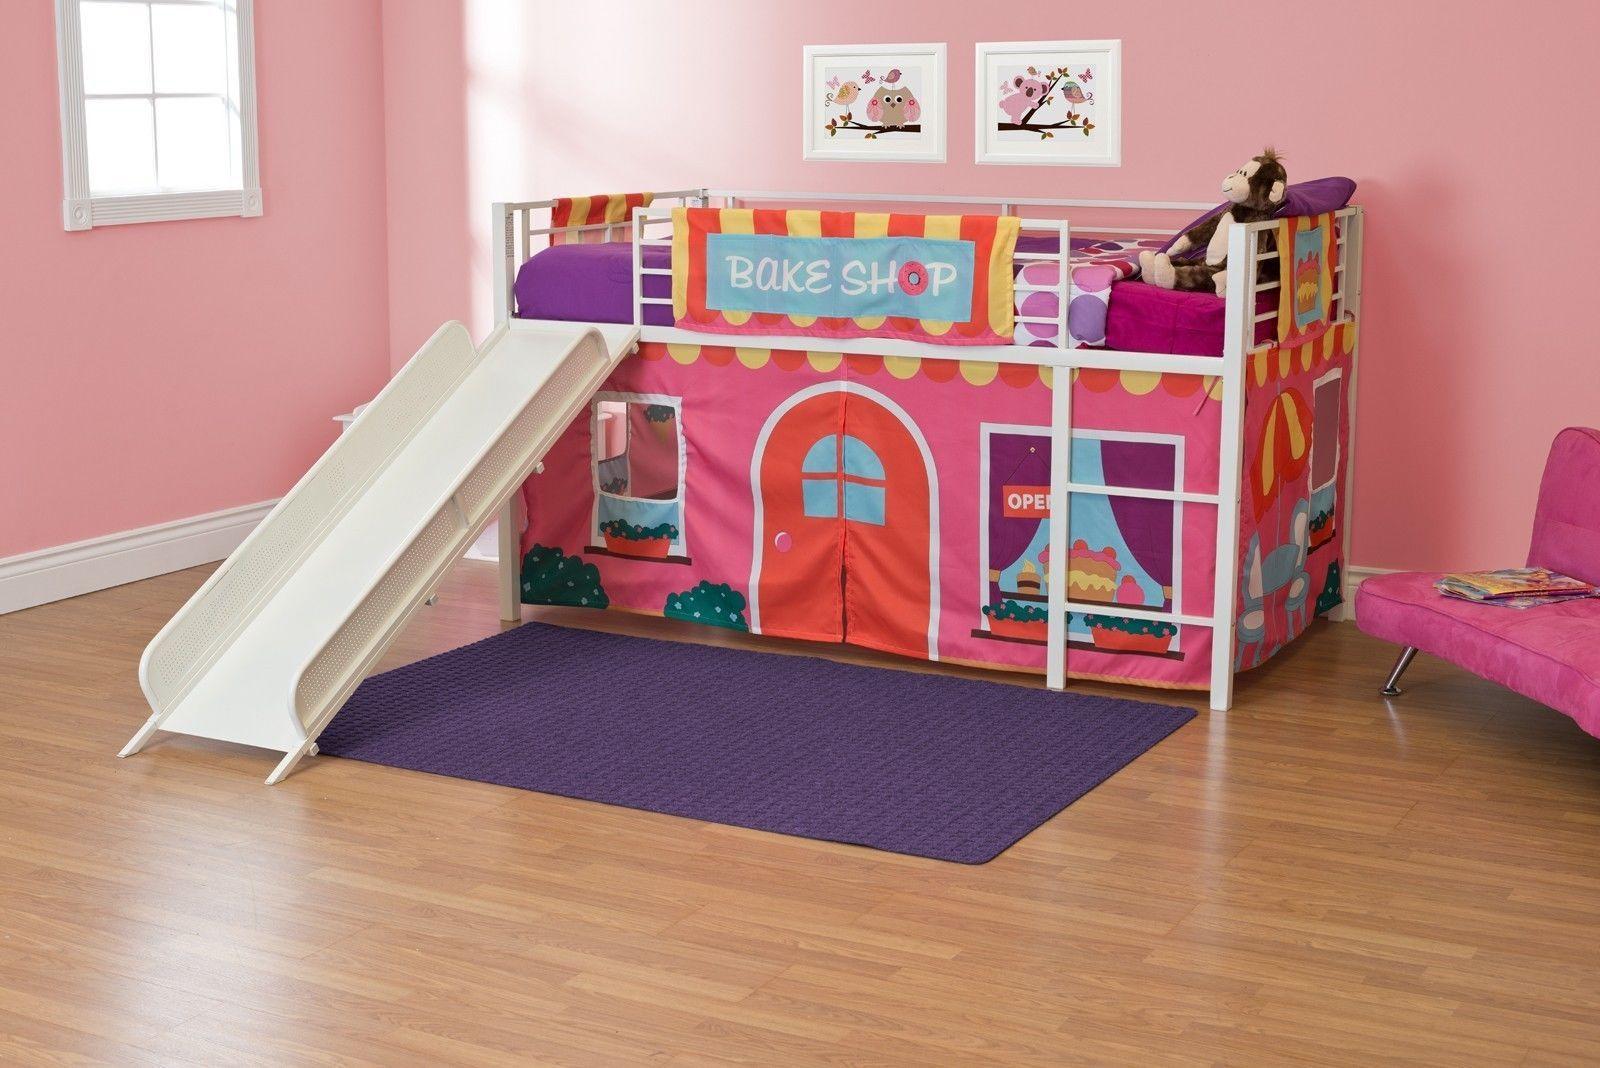 Love Loft Bed Curtain Set Tent Twin Size Bake Shop Playroom Fun Decor Bedroom Furniture Junior Loft Beds Girls Loft Bed Girls Bedroom Furniture